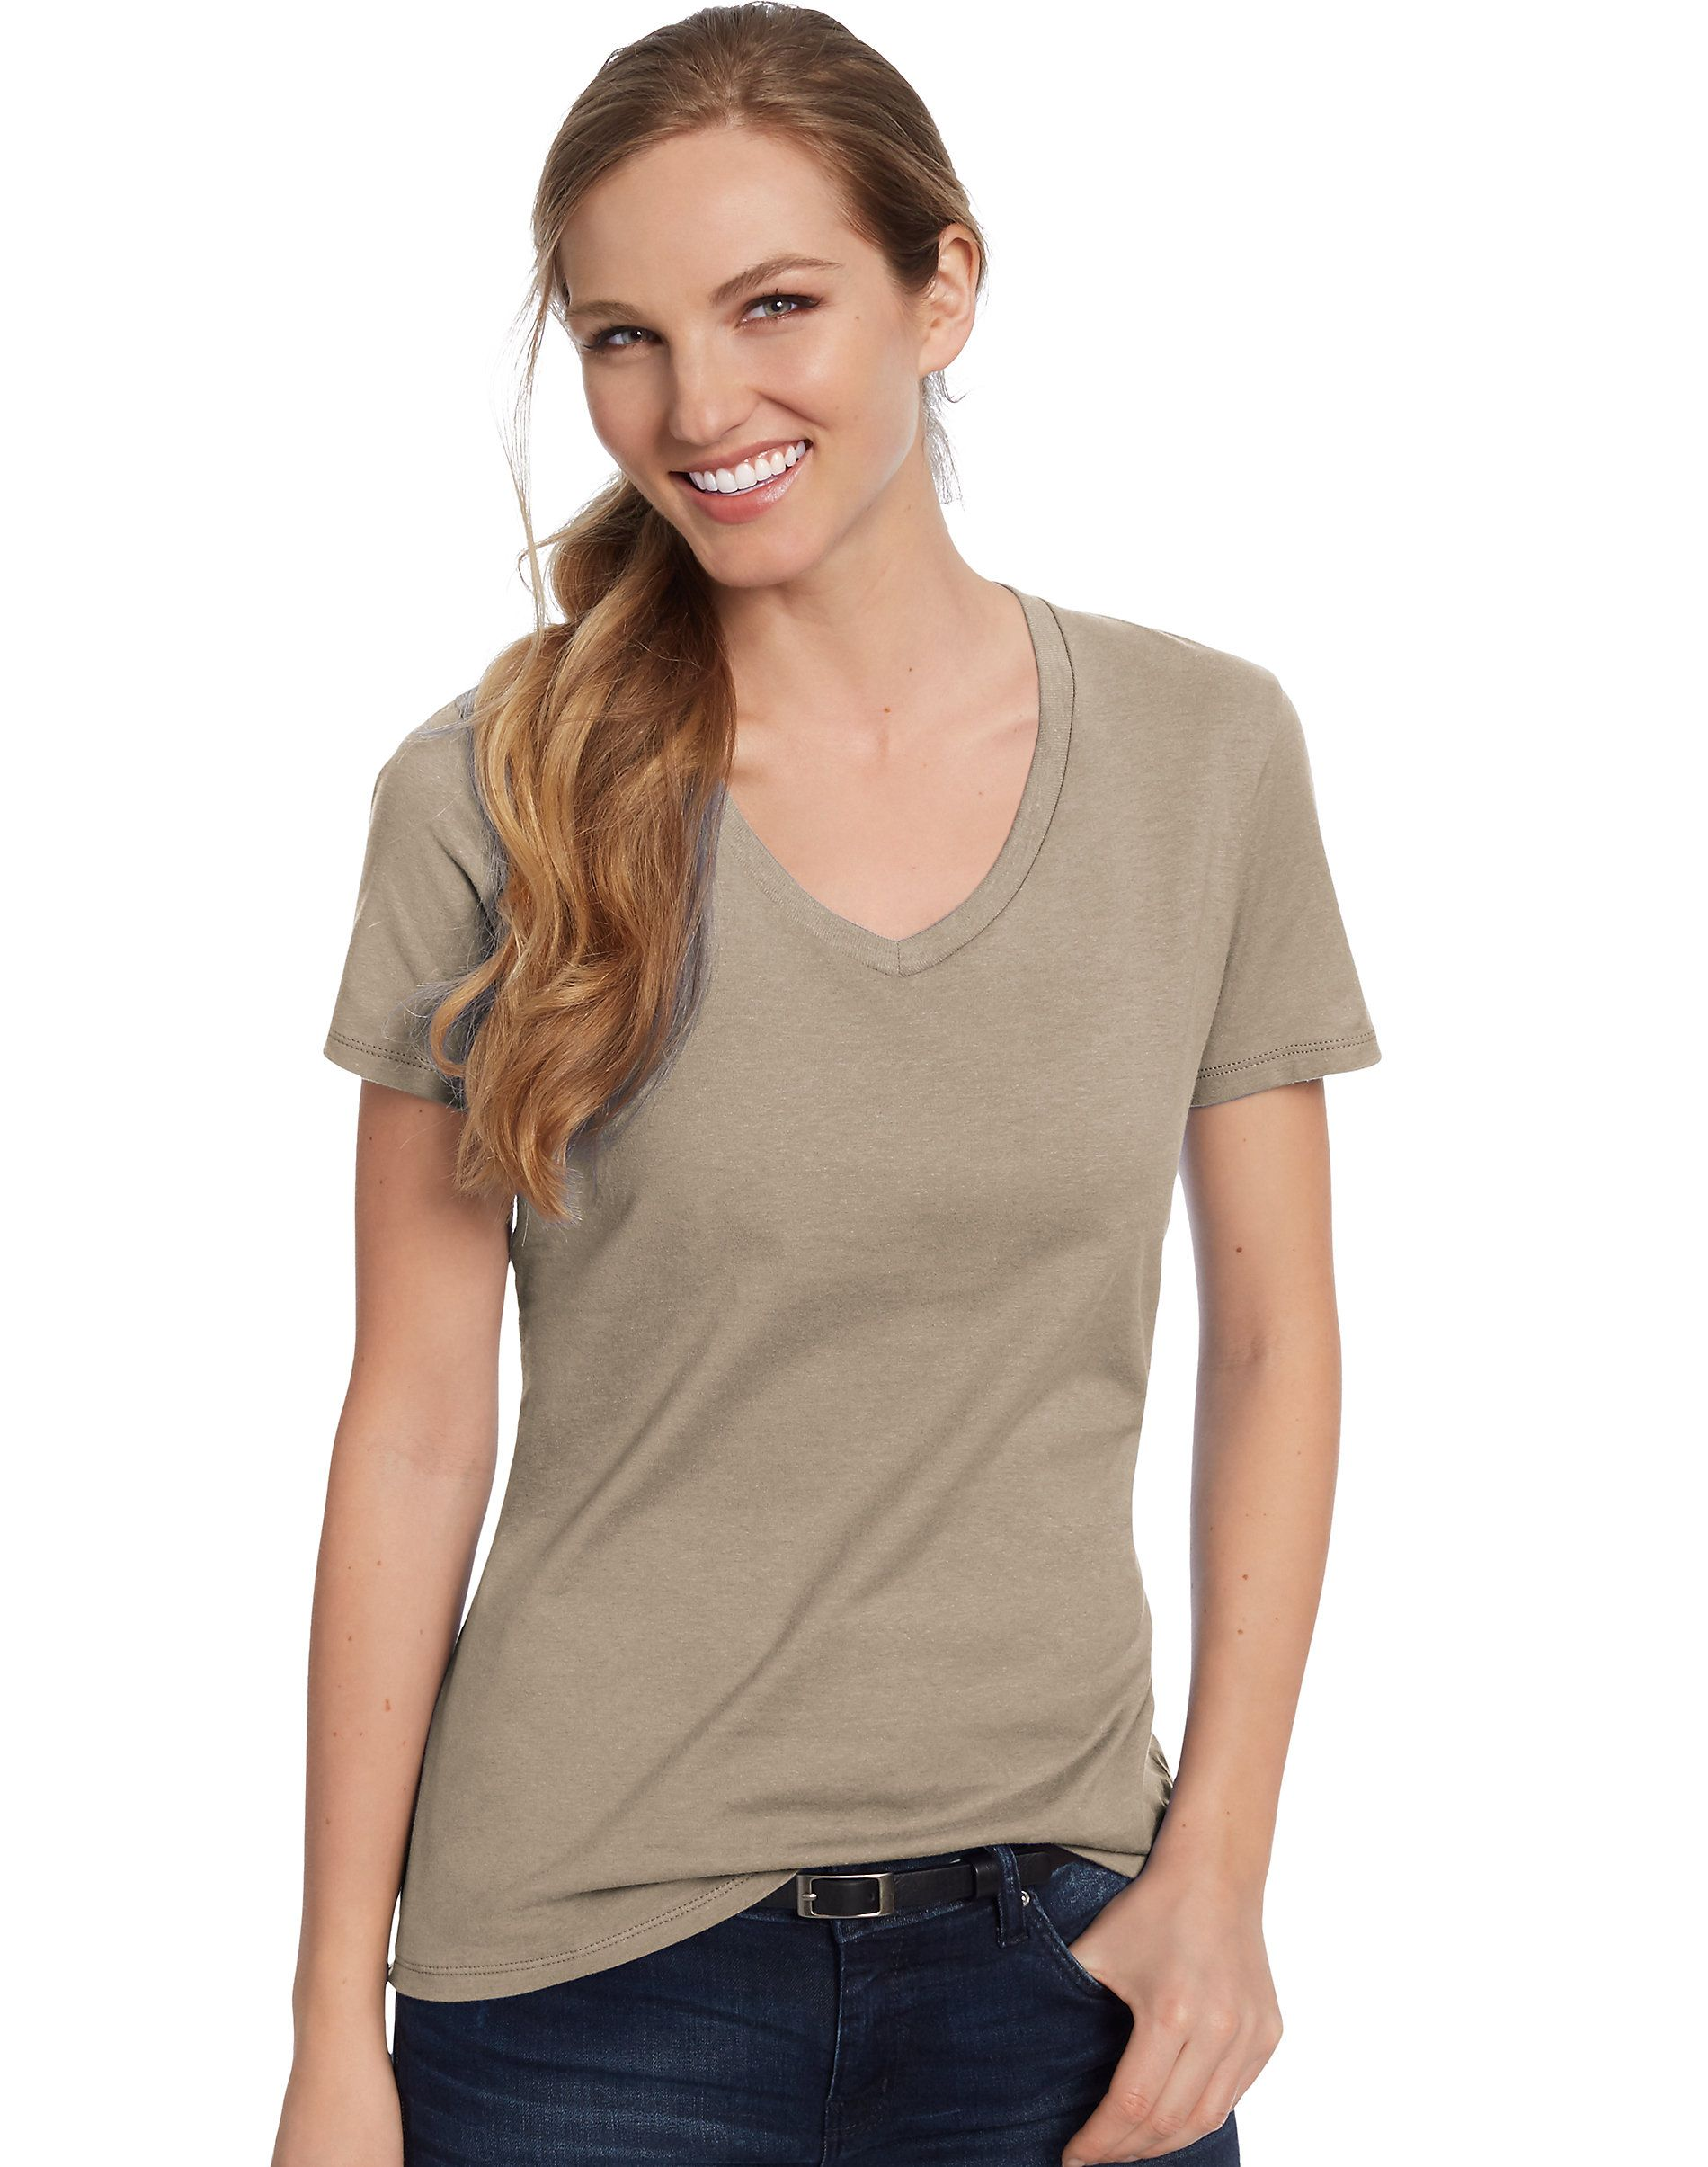 f96bd1569afa59 Hanes Womens T-Shirt Short Sleeve Top Nano-T V-Neck Solid Plain 100 ...